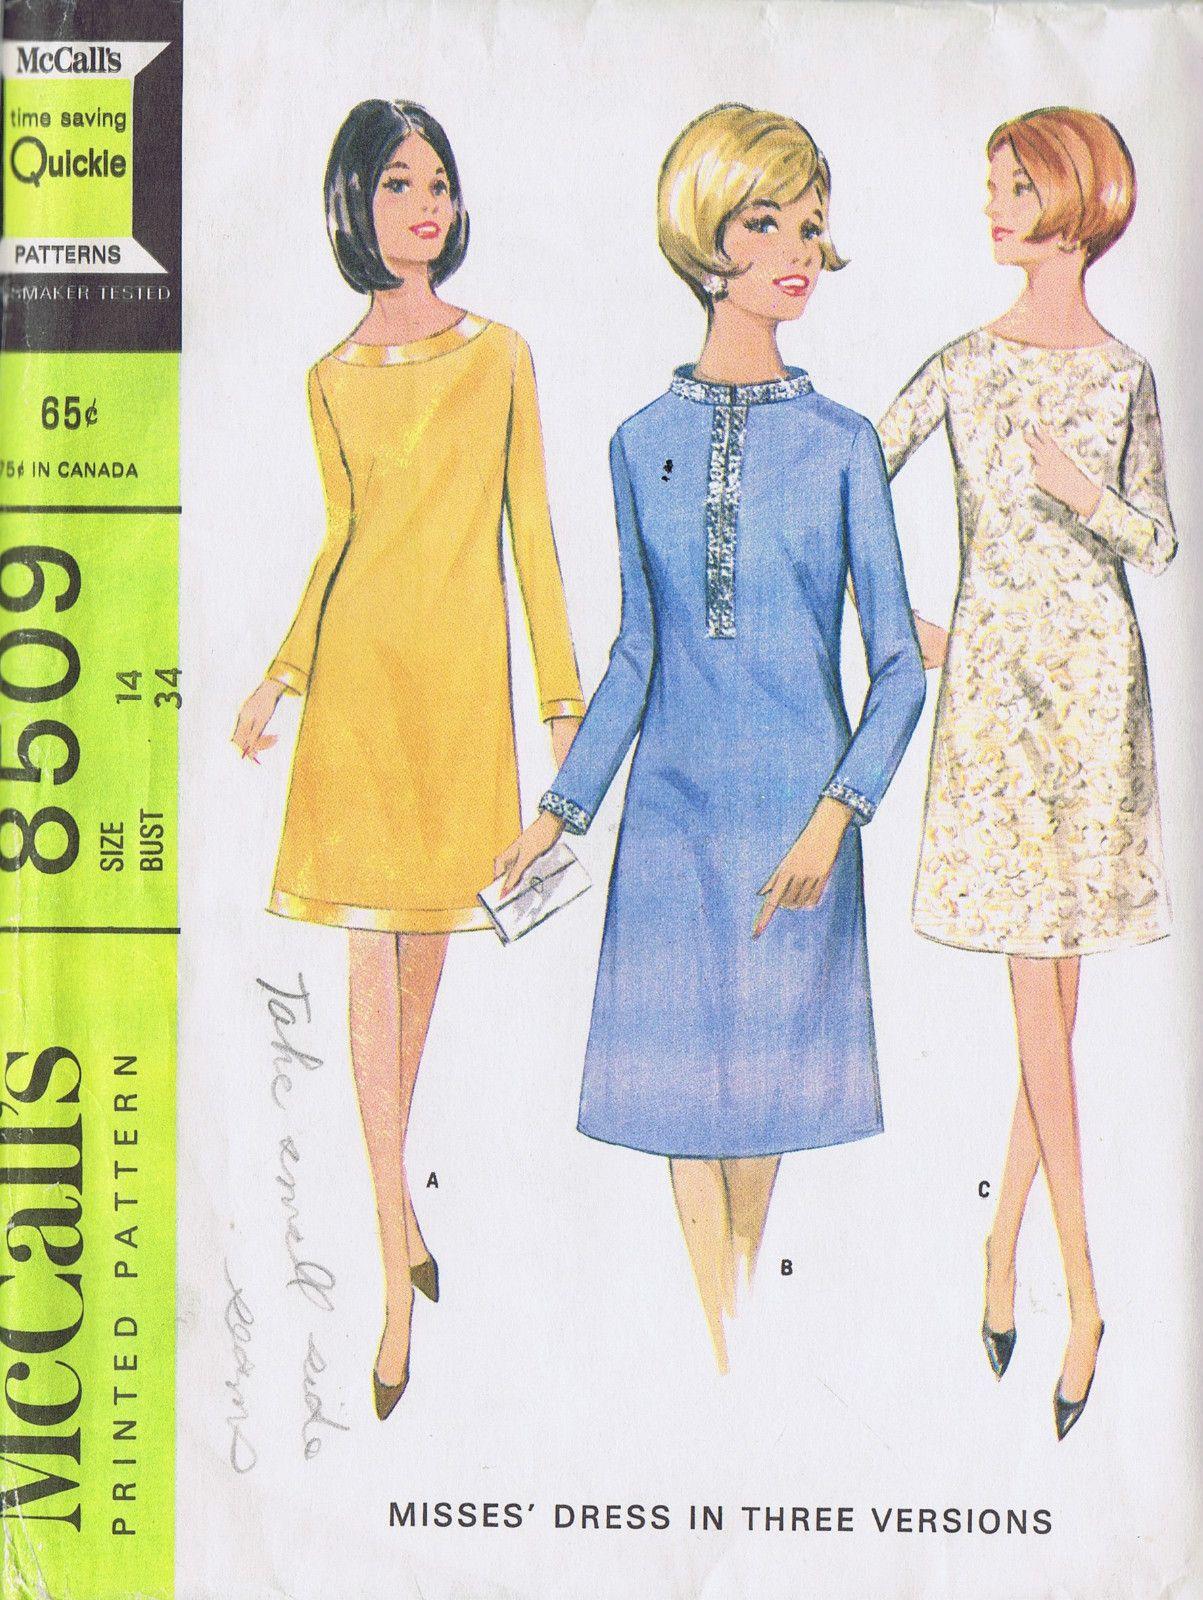 60s VINTAGE SHEATH DRESS SEWING PATTERN MCCALL\'S 8509 SZ 14 BUST 34 ...